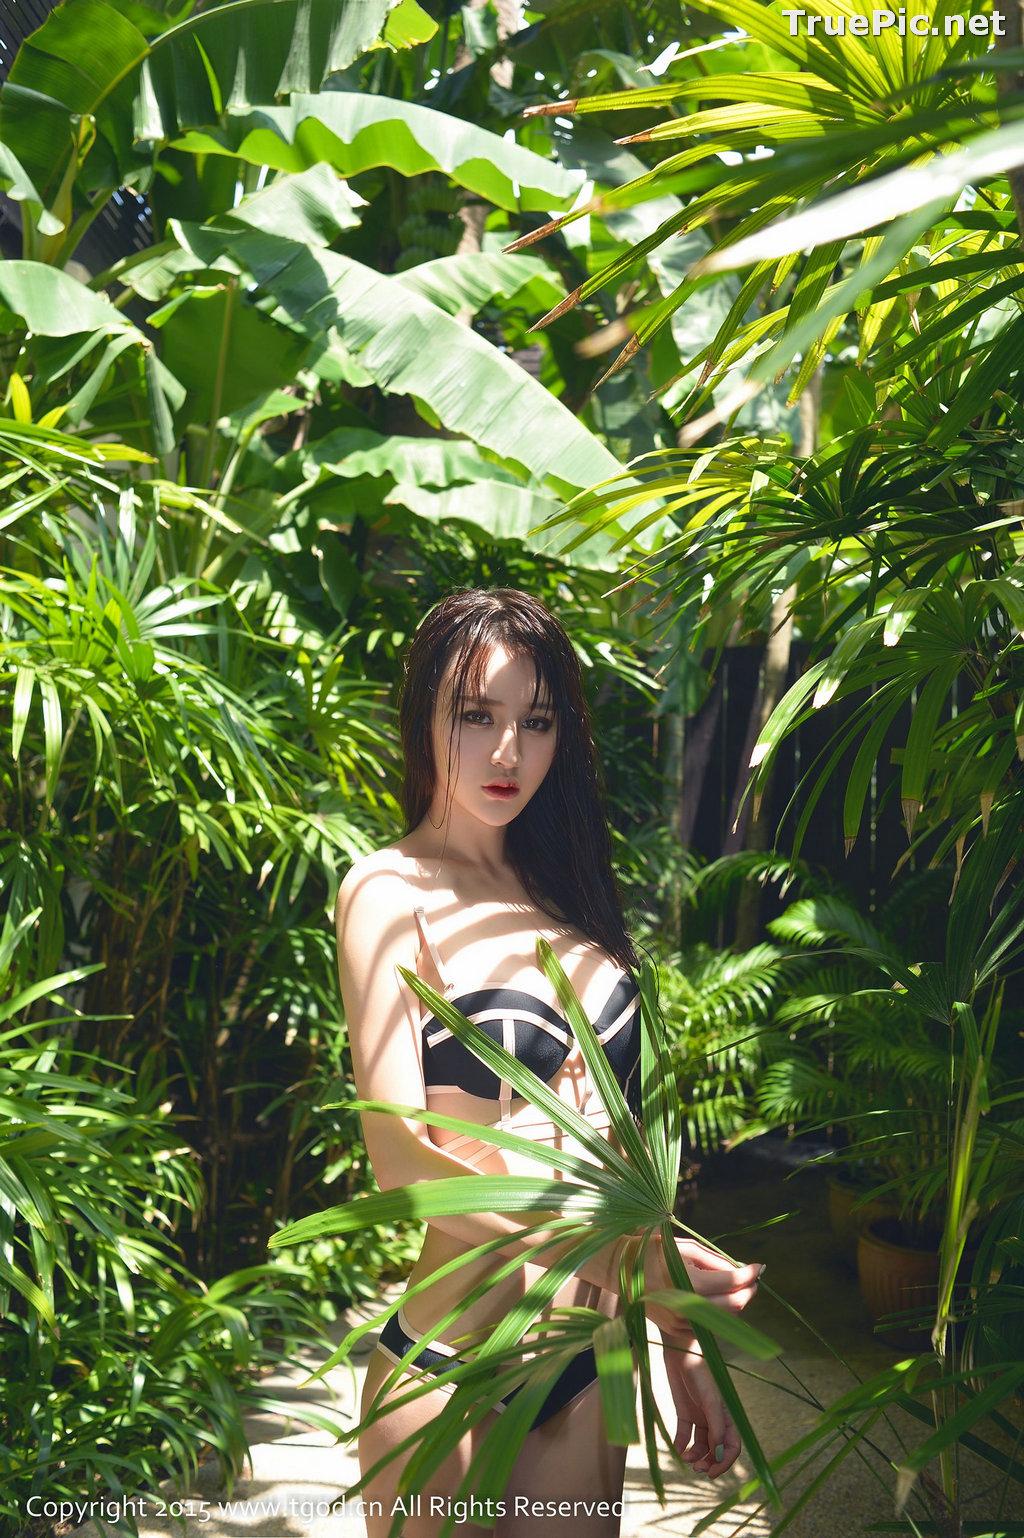 Image TGOD 2015-11-10 - Chinese Sexy Model - Cheryl (青树) - TruePic.net - Picture-22